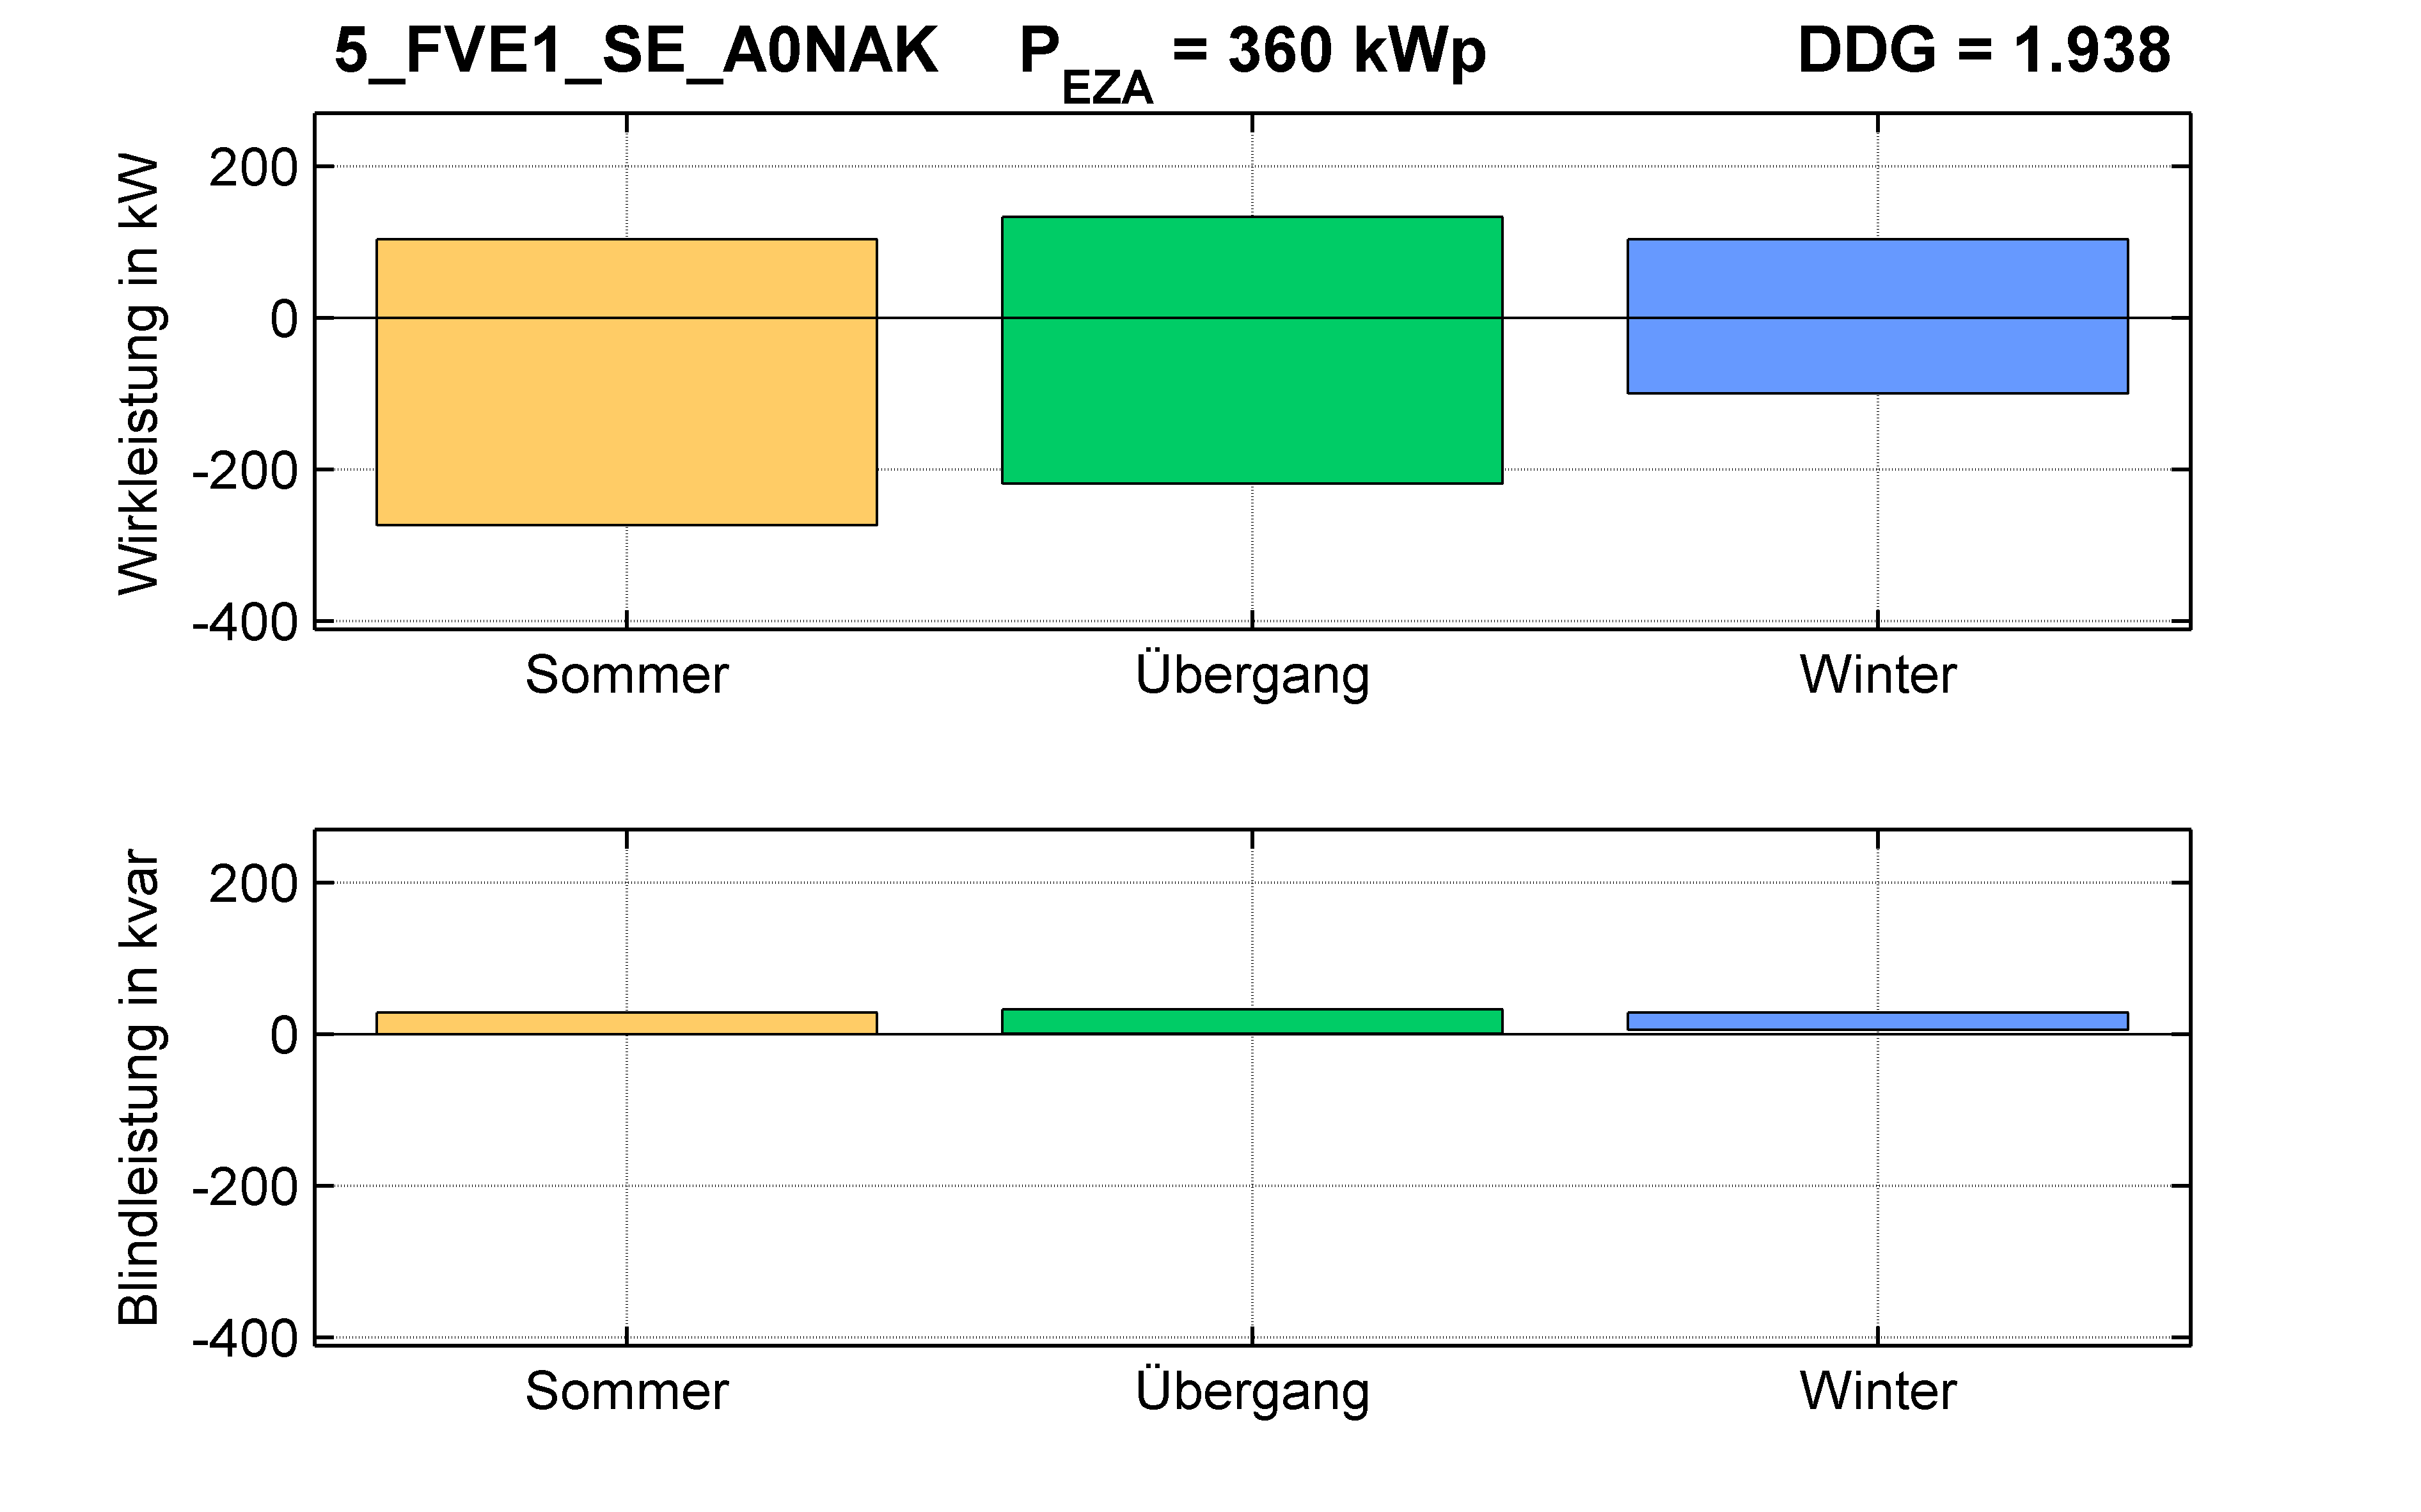 FVE1 | STATION (SE) A0NAK | PQ-Bilanz